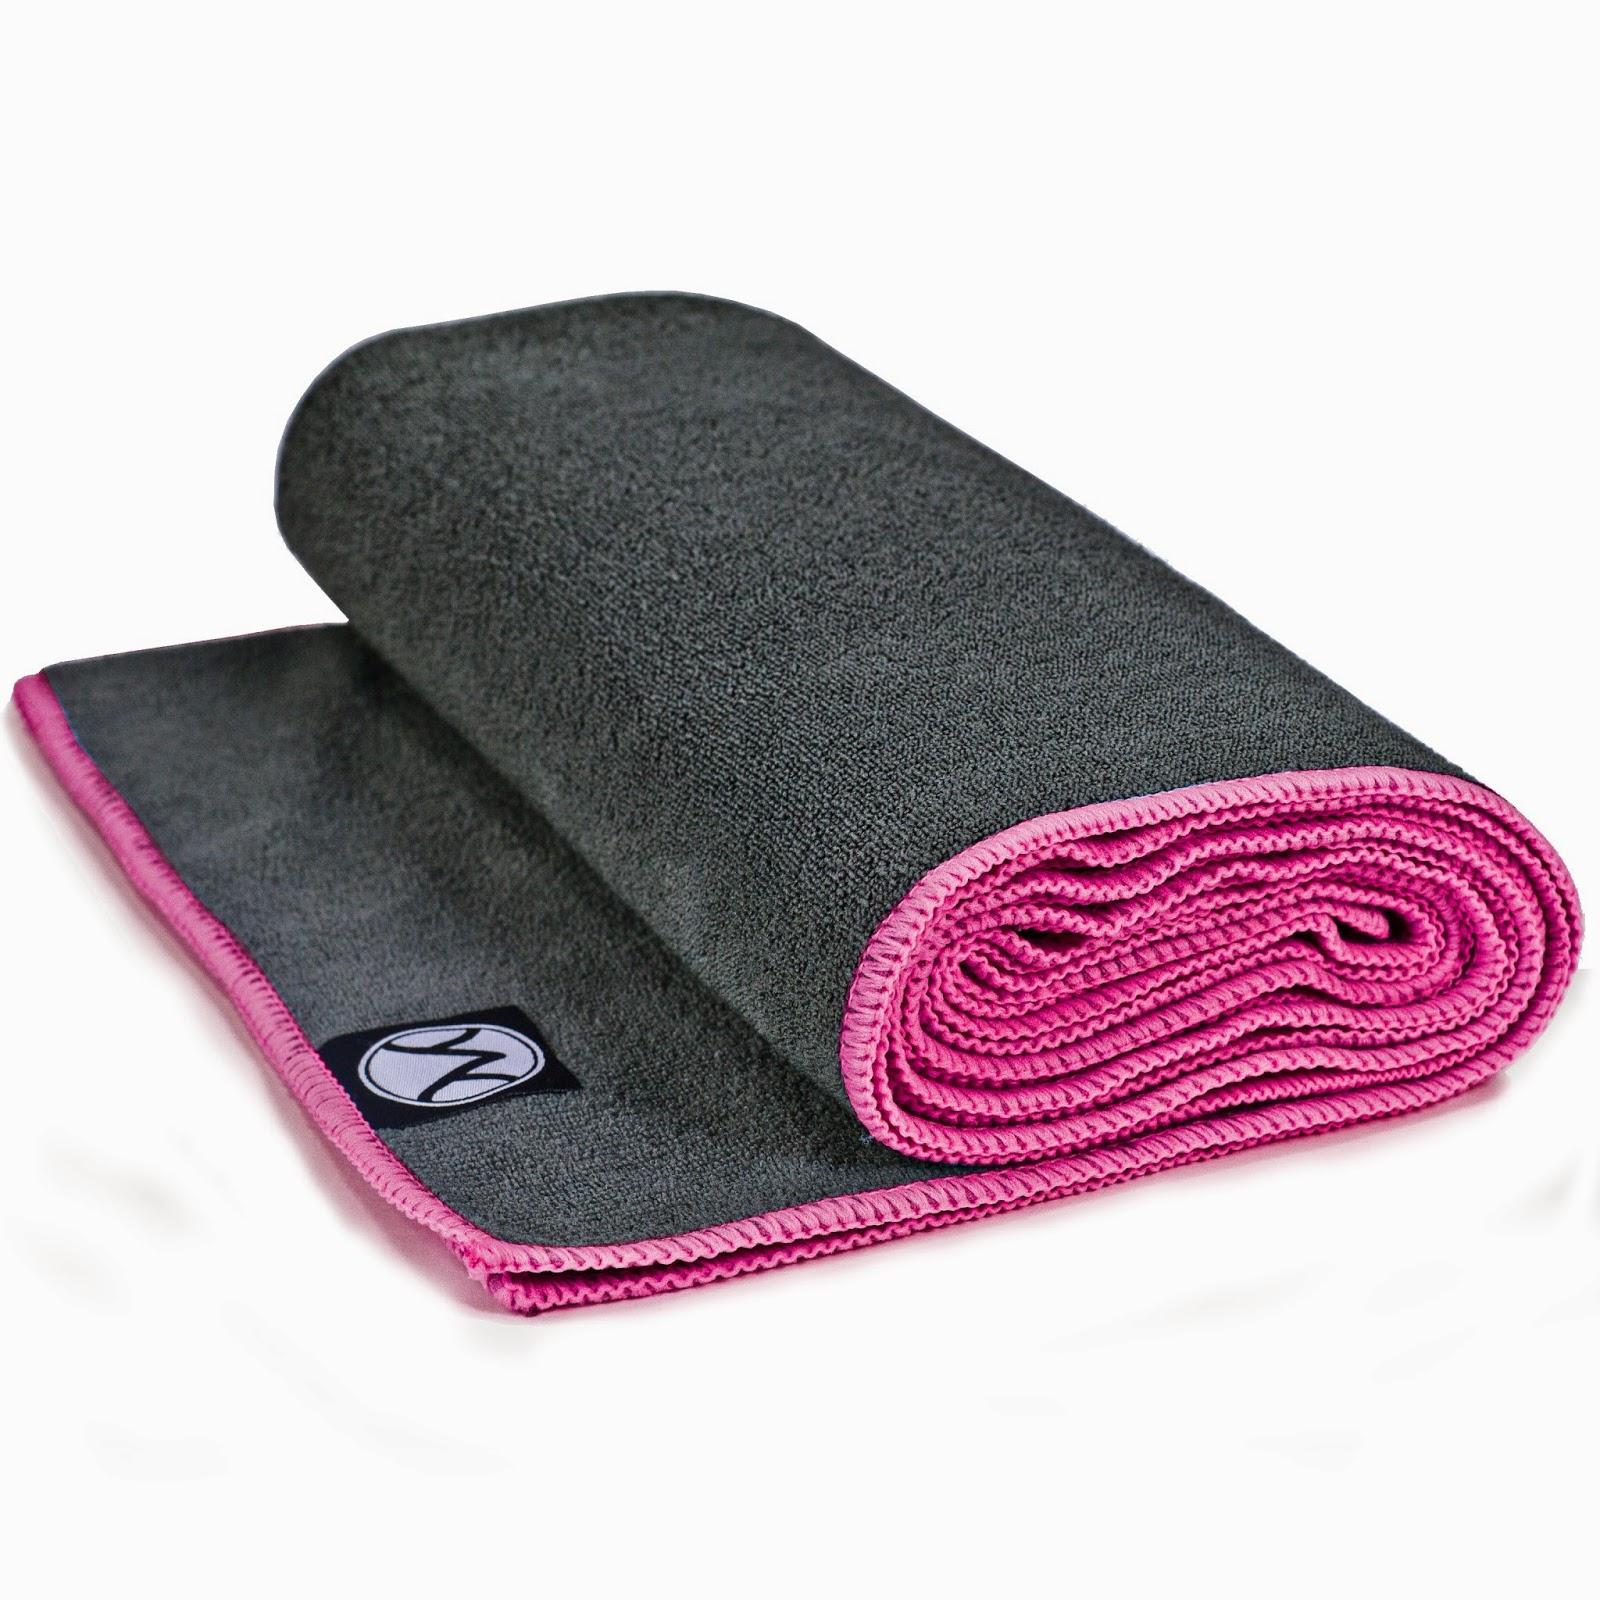 Mygreatfinds: Youphoria Yoga Towel Review